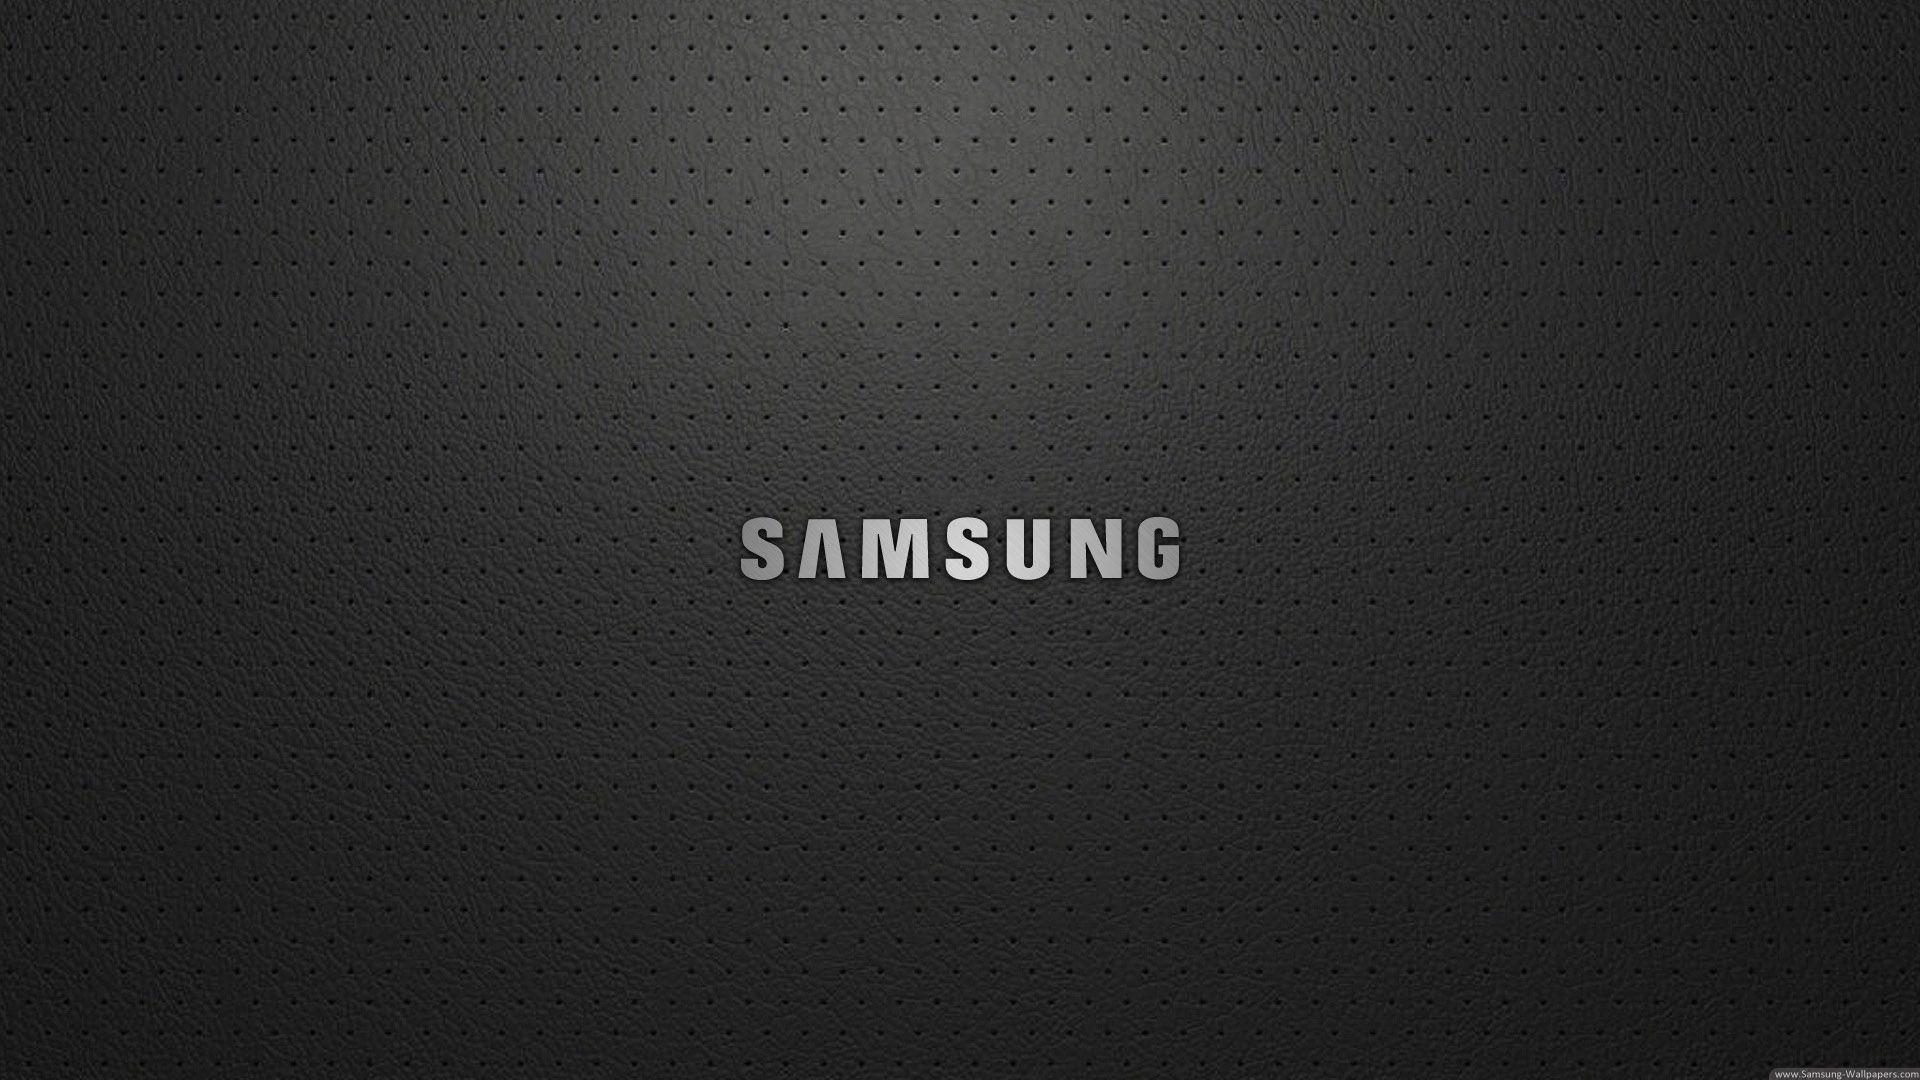 Samsung Logo Desktop 1920x1080 Galaxy S4 Wallpaper HD_Samsung ...